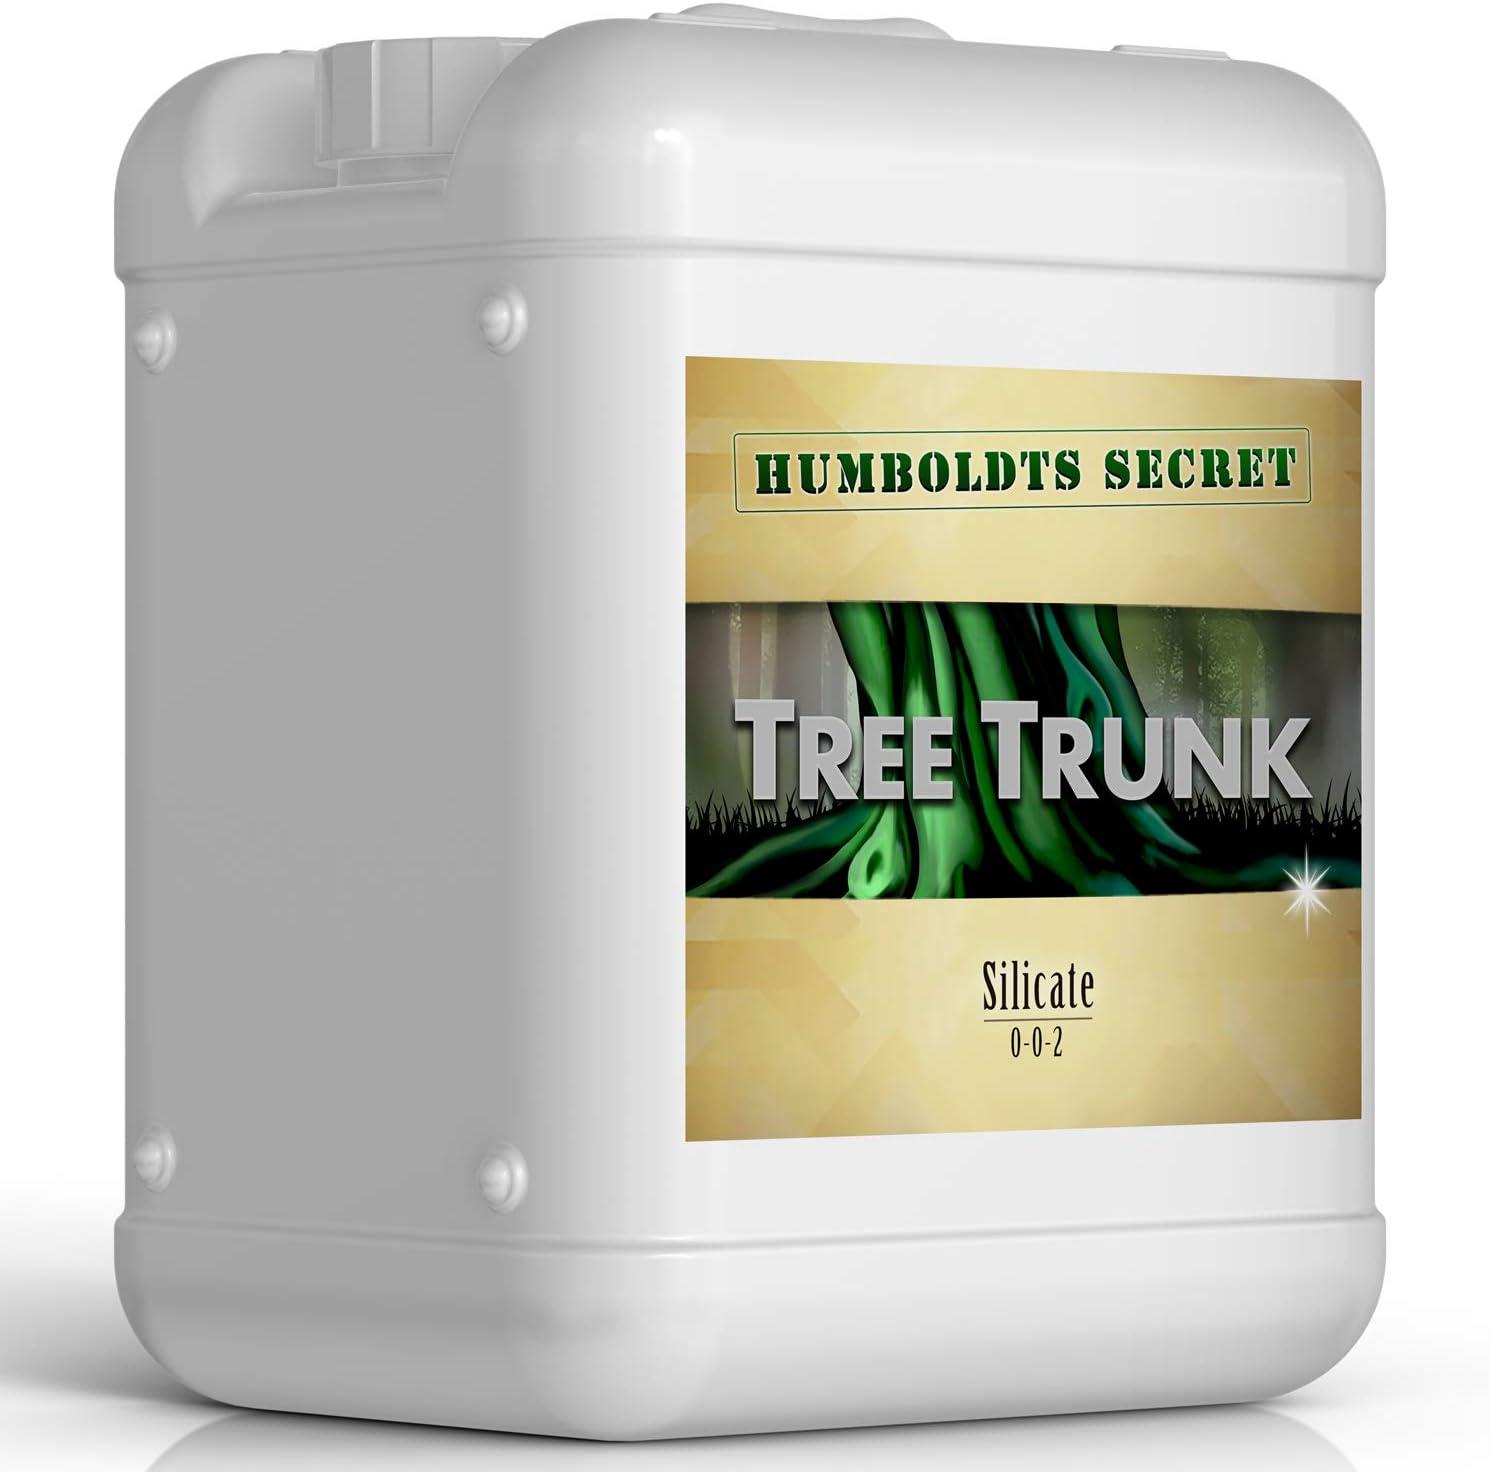 Humboldts Secret Tree Trunk - shop Advanced Silicate Nutri Additive online shop